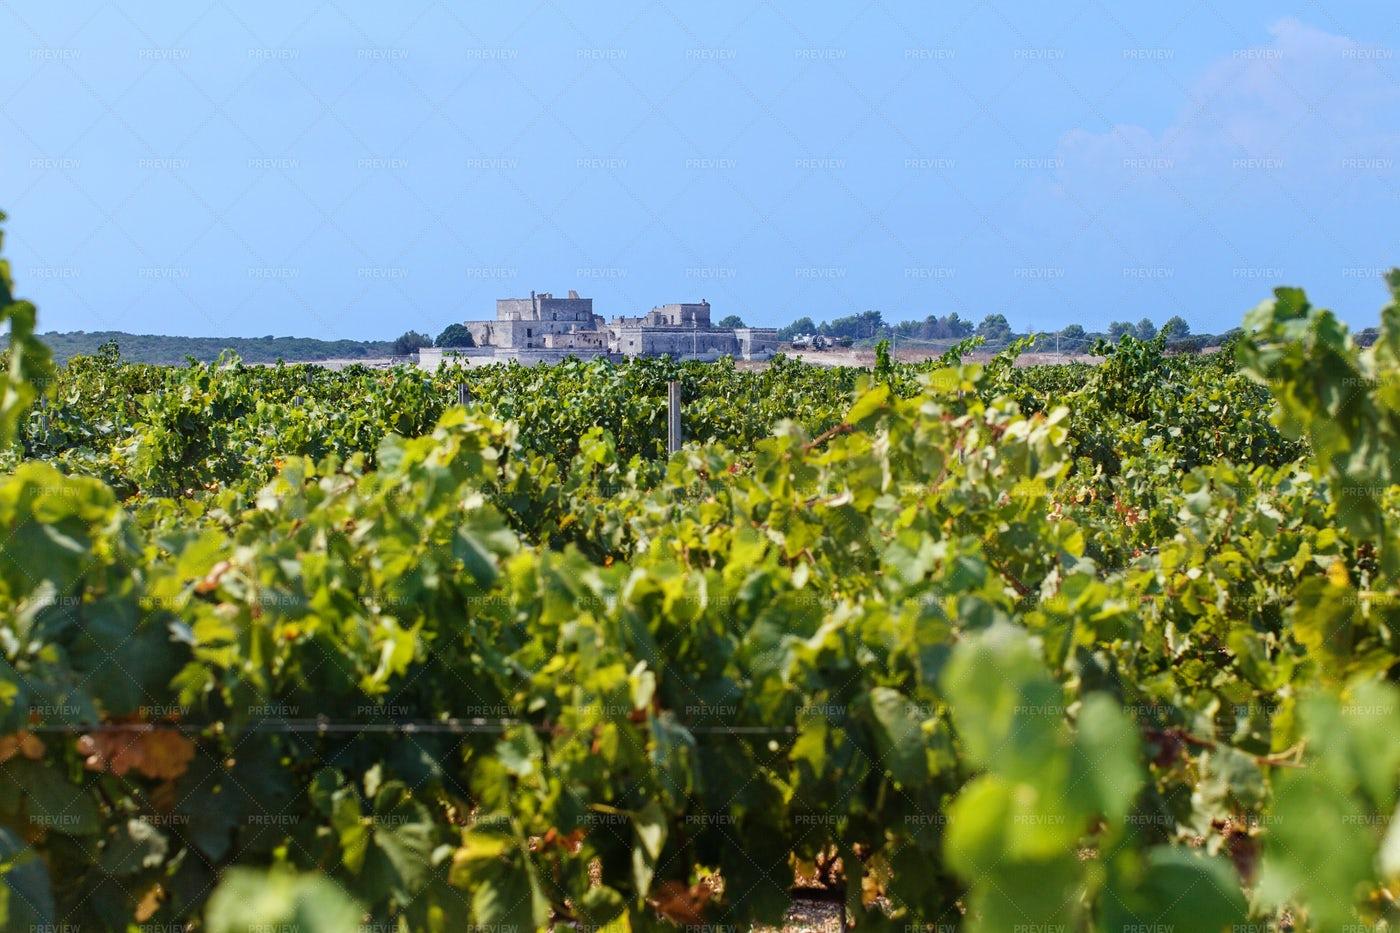 Vineyard In South Italy: Stock Photos